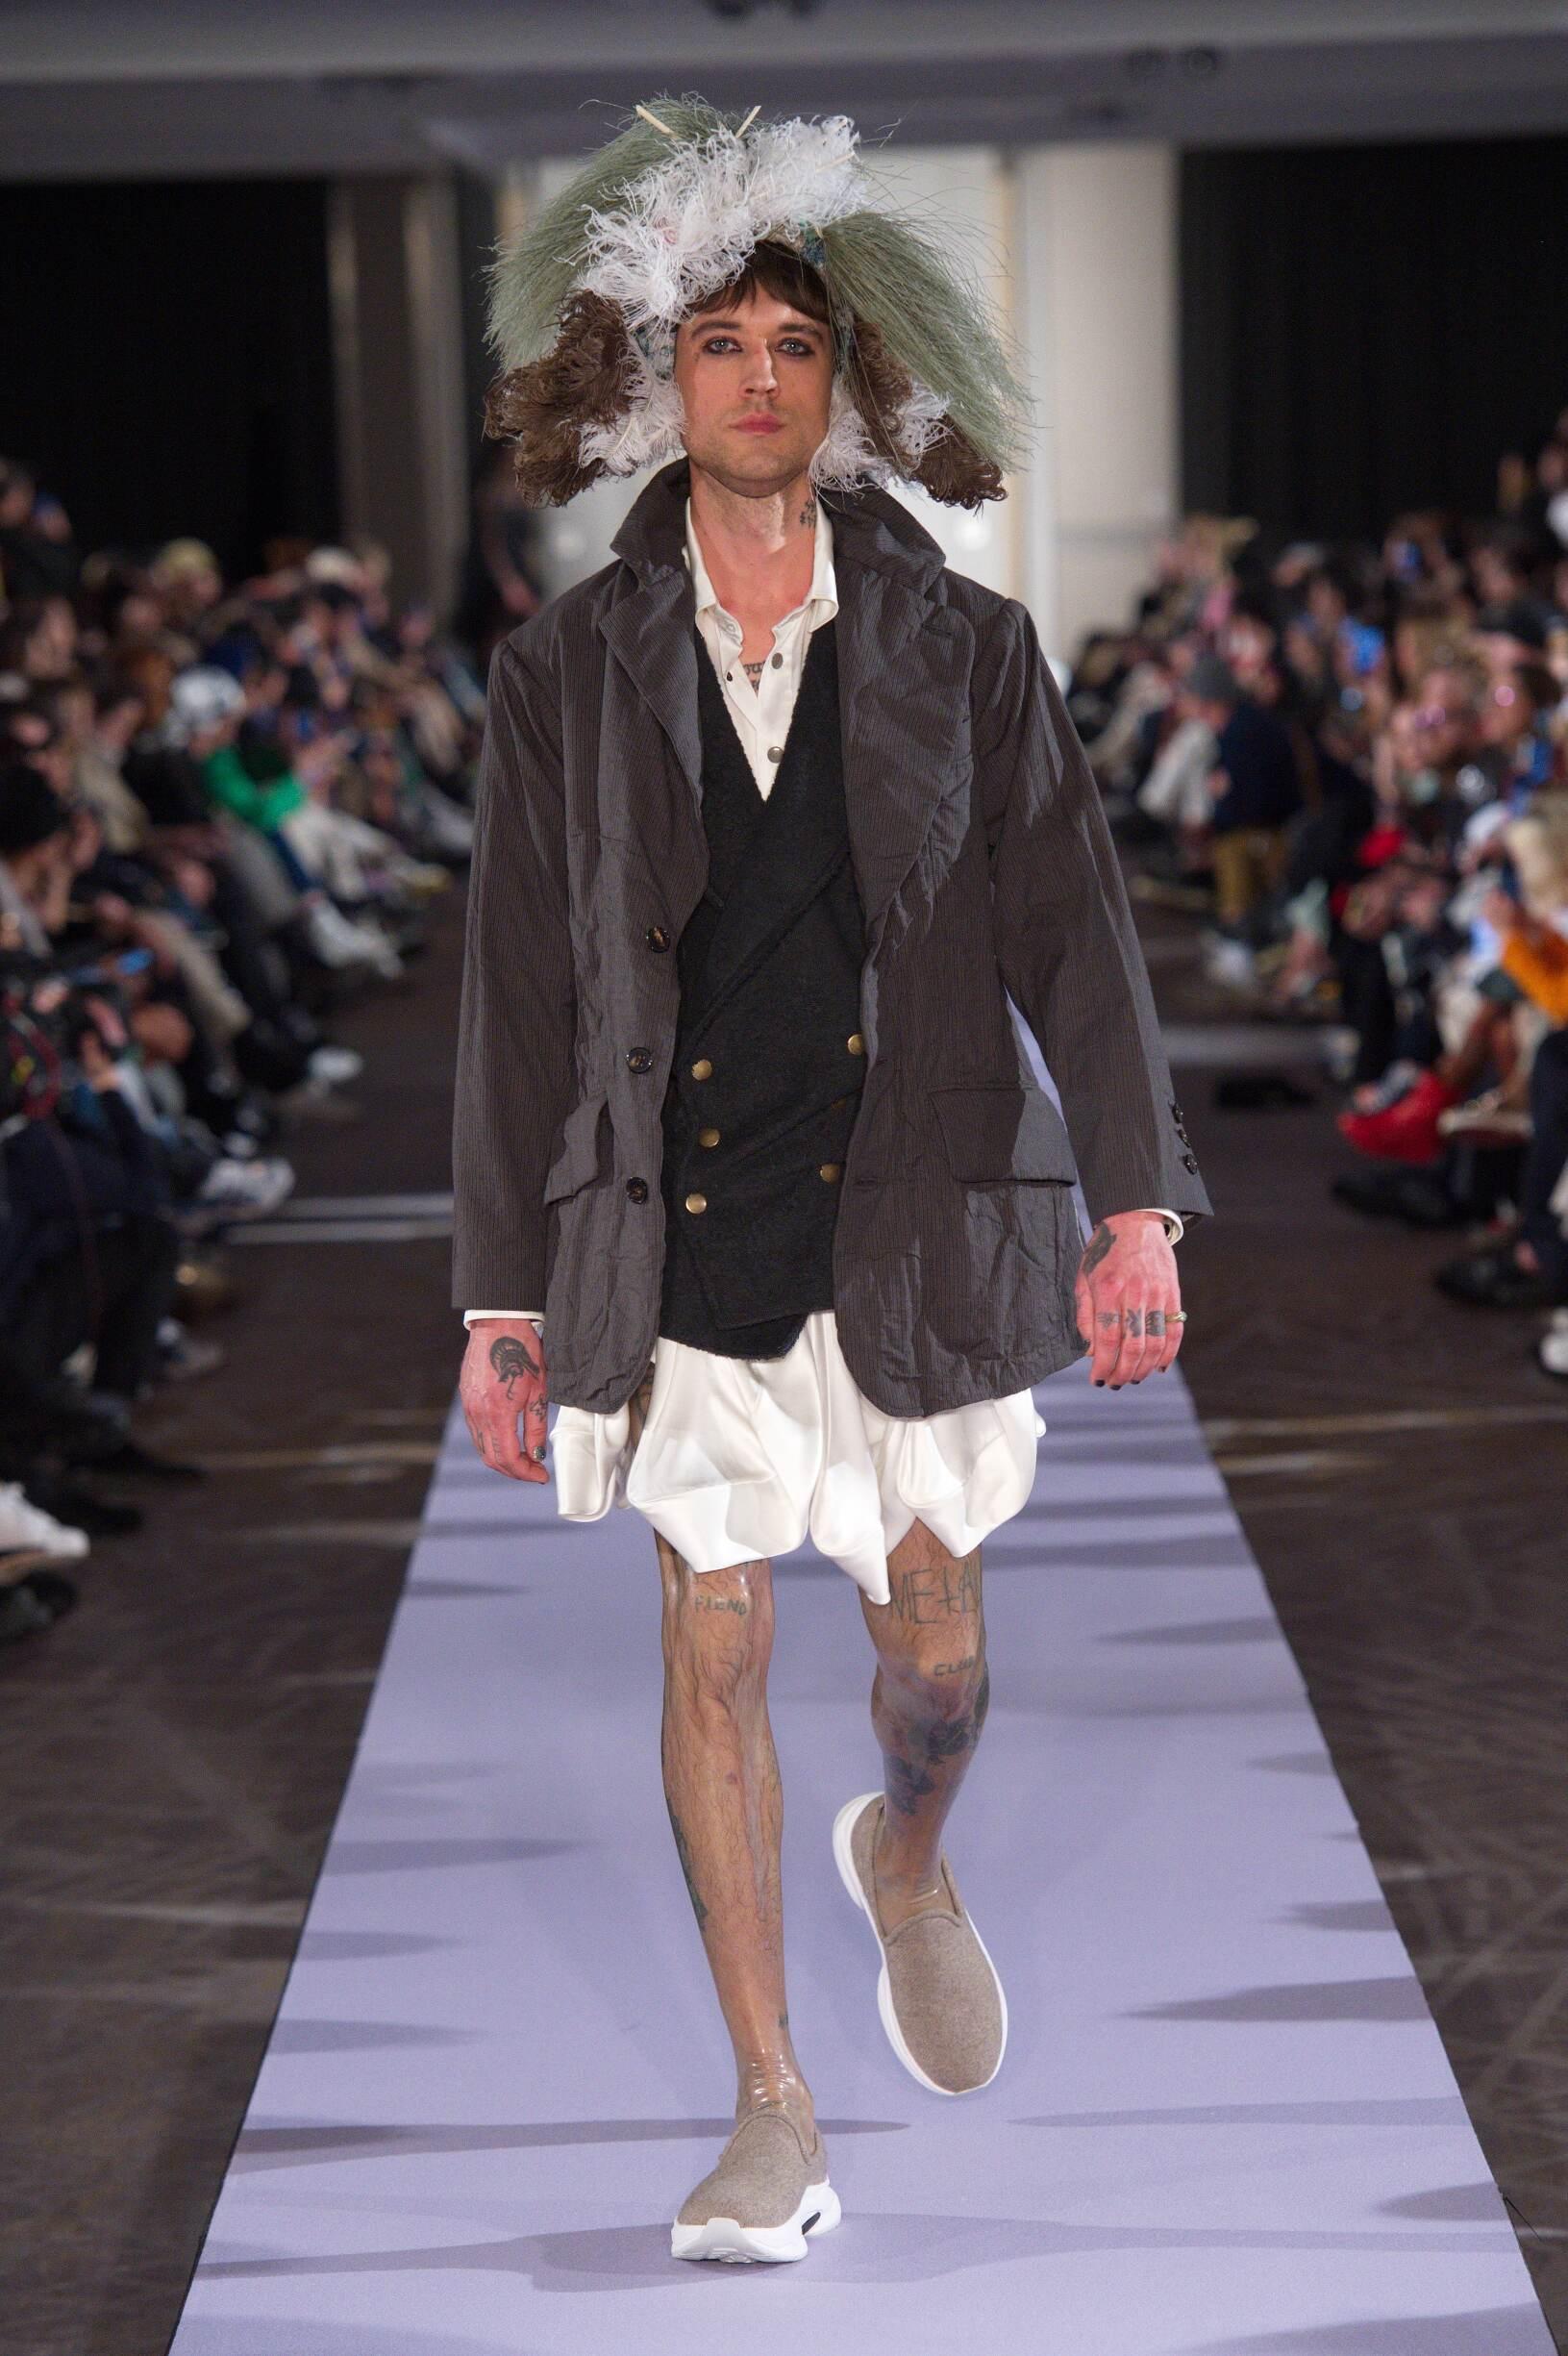 Andreas Kronthaler for Vivienne Westwood Paris Fashion Week Menswear 2019-20